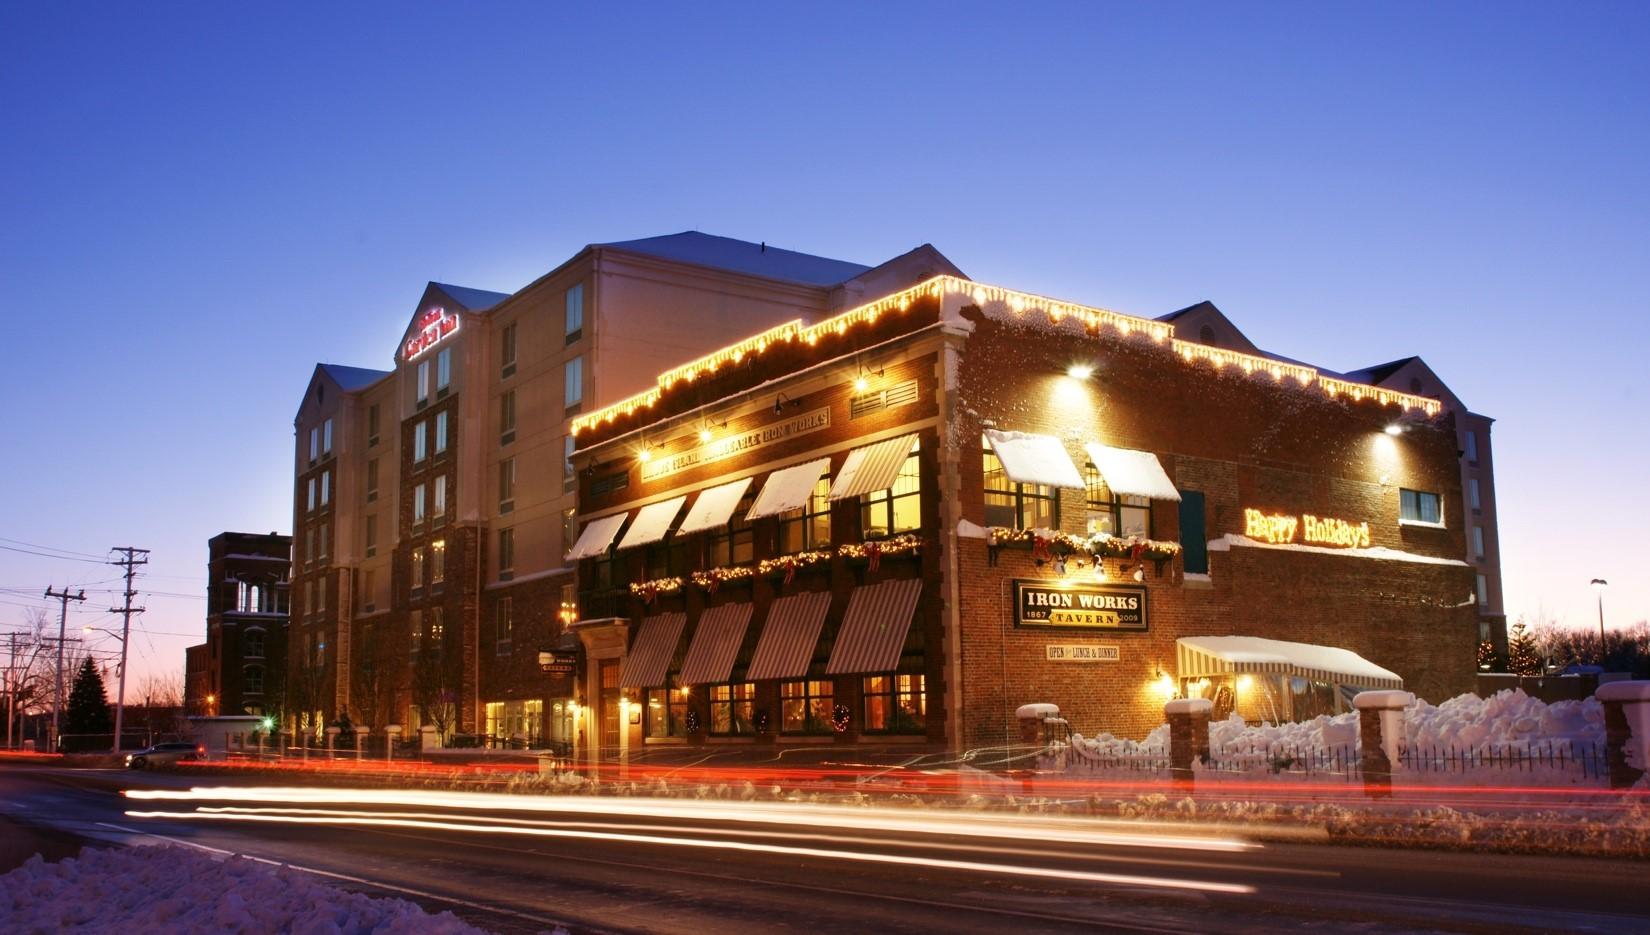 MCR Acquires Hilton Garden Inn at Rhode Island\'s Outstanding ...